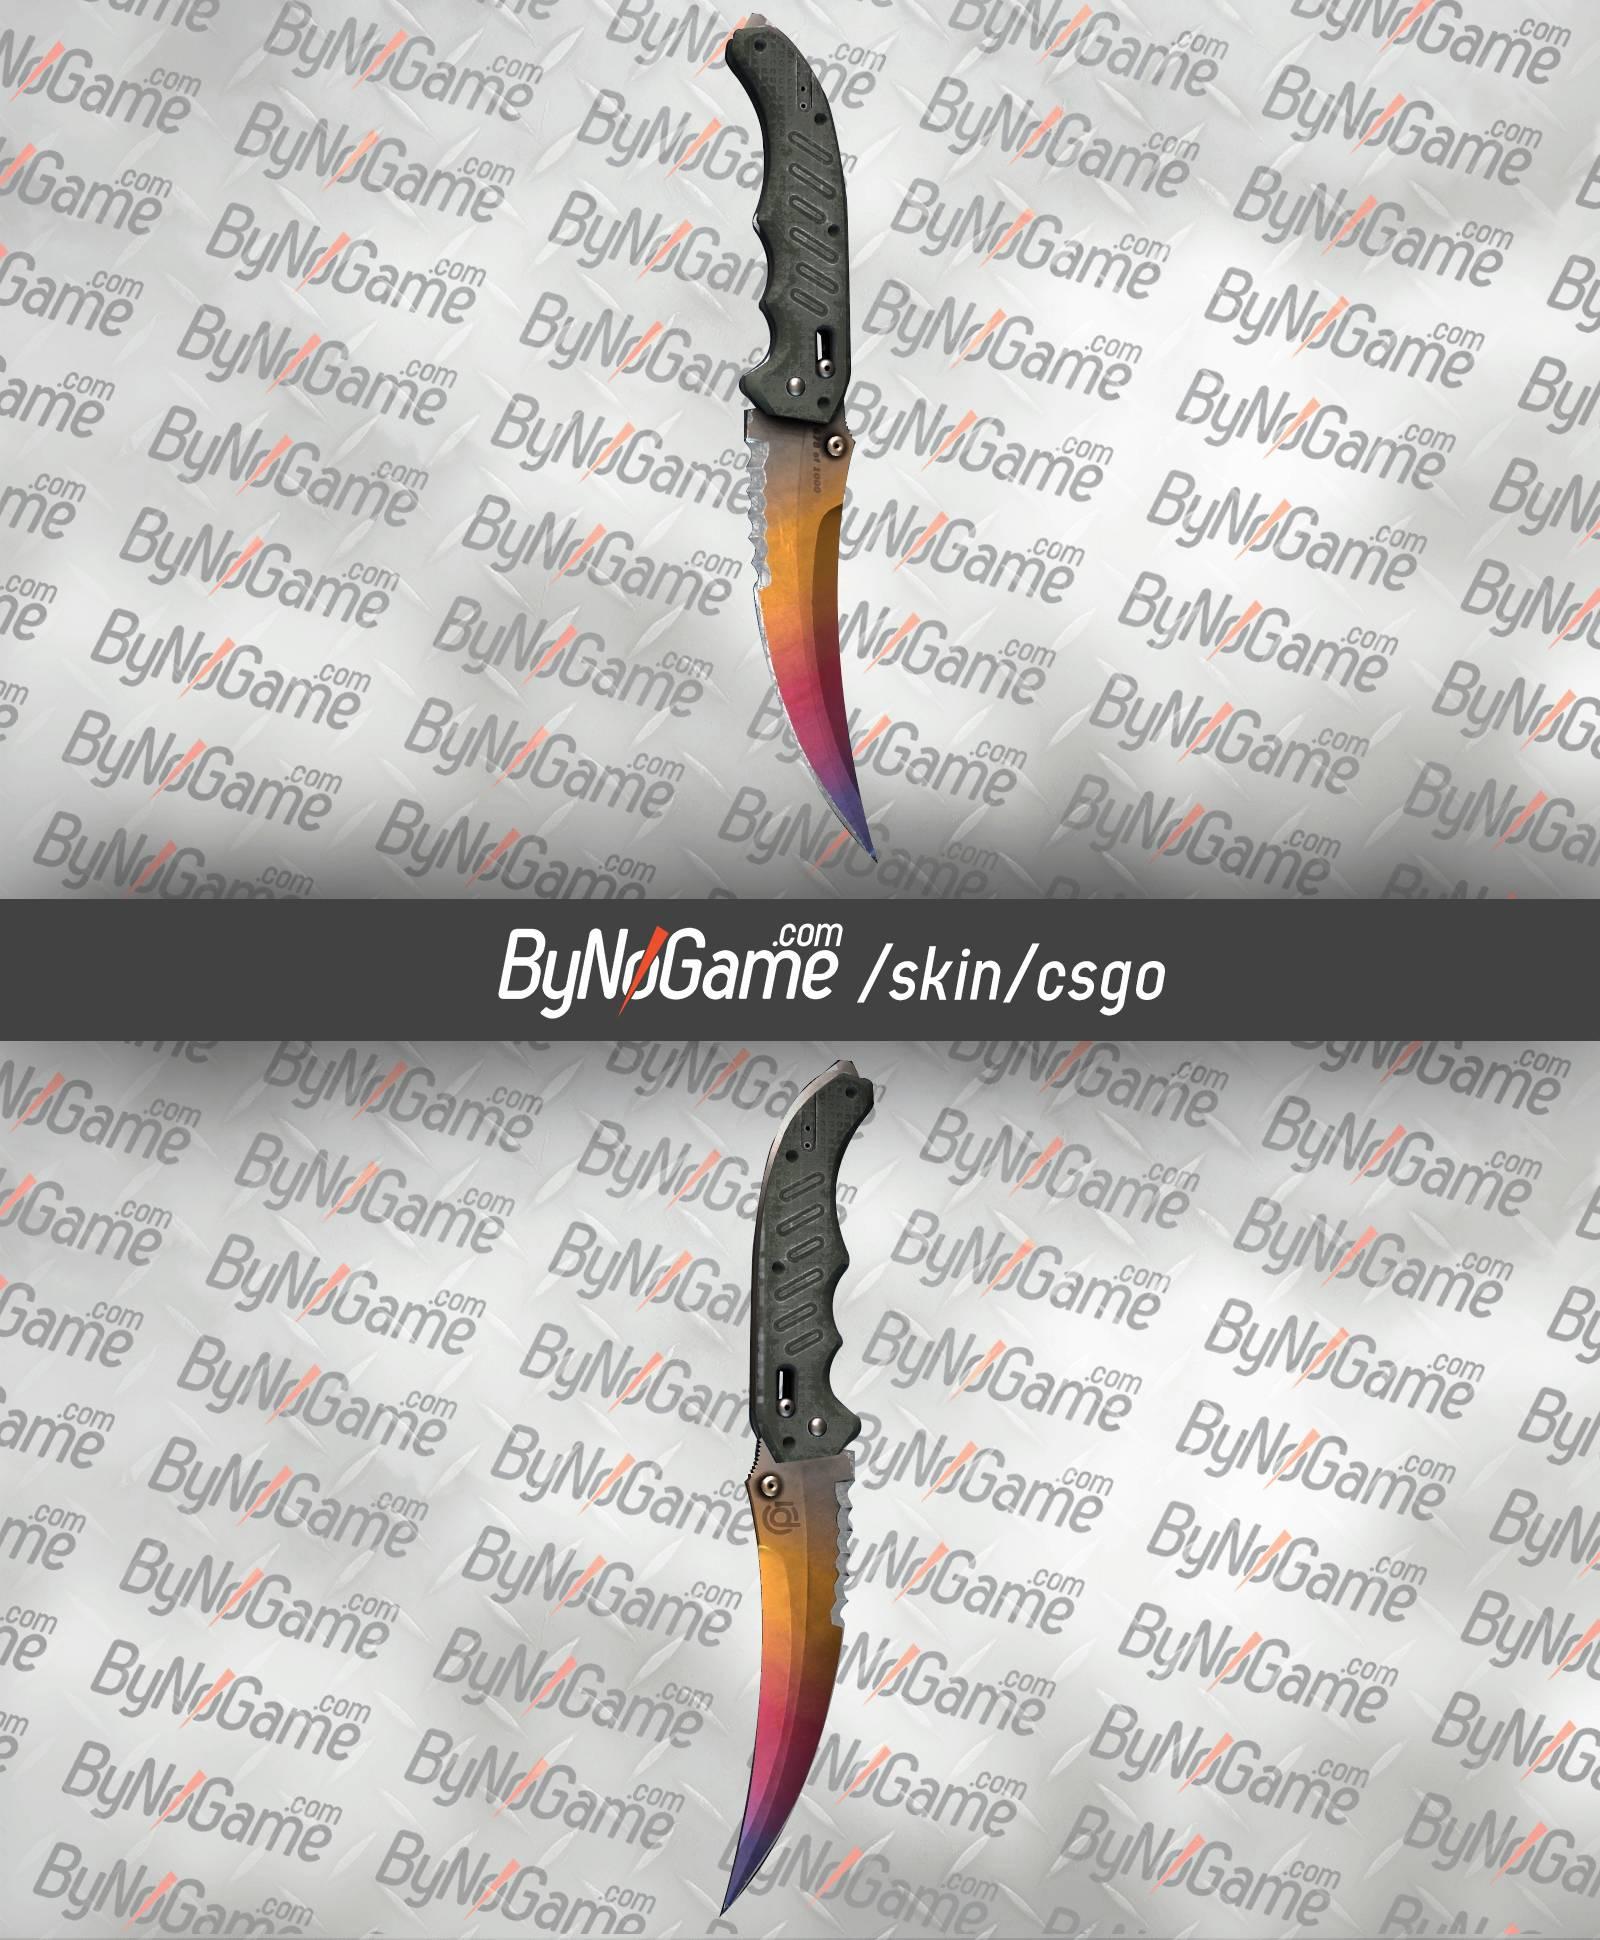 Flip Knife   Fade (Factory New) - Knives - CSGO Skin - ByNoGame